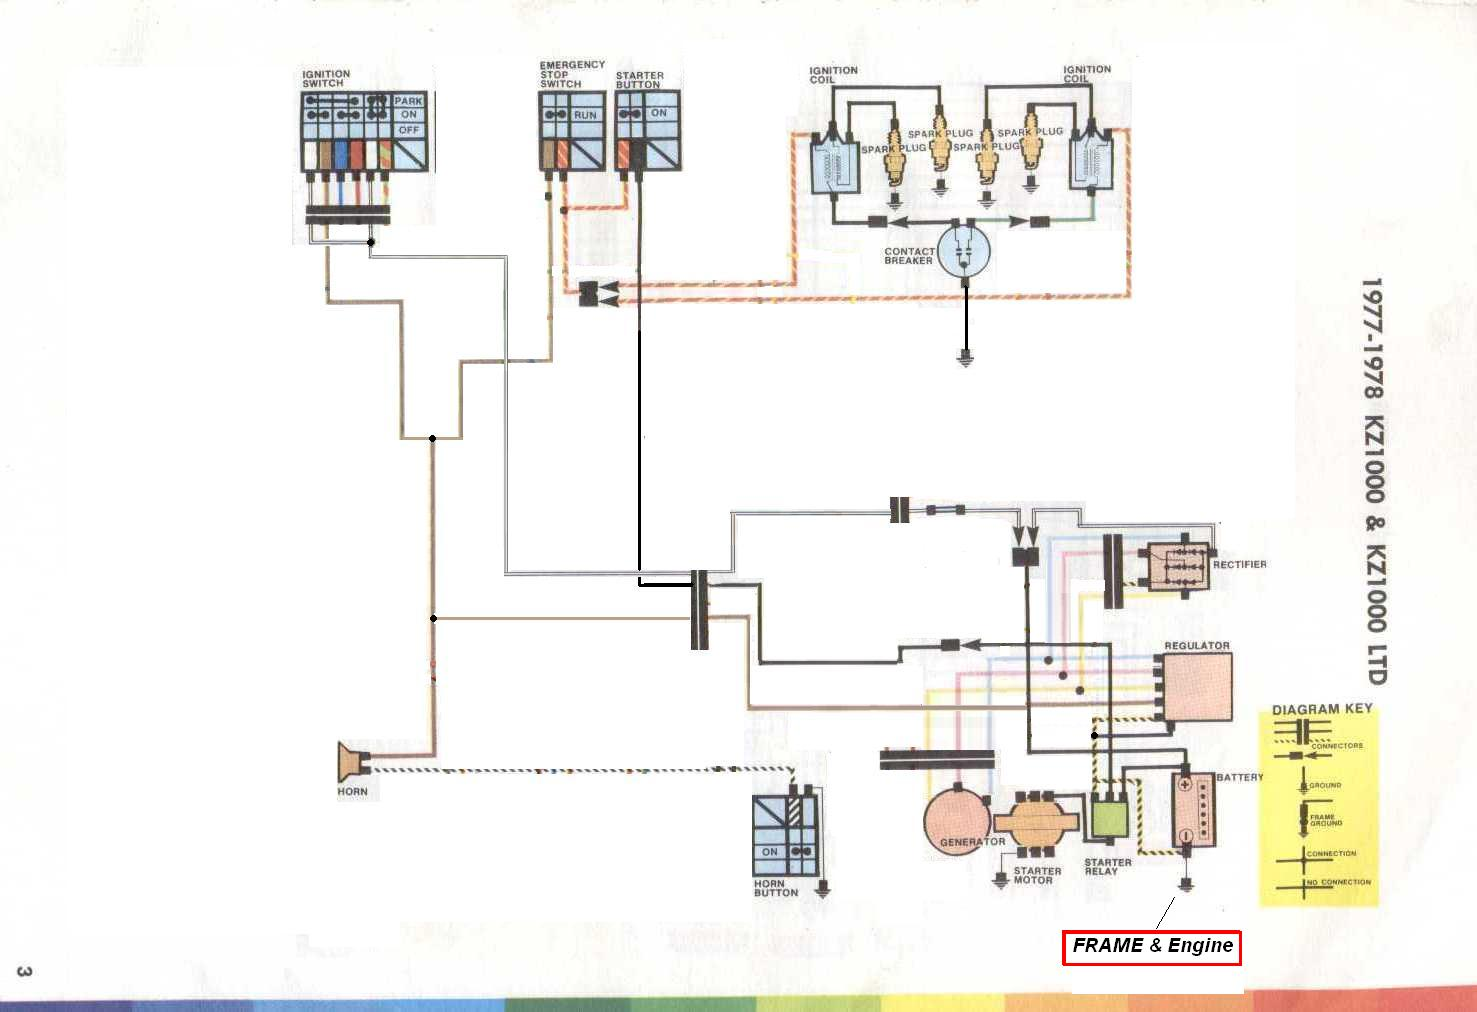 Kz1000 Police Wiring Diagramon Kawasaki Kz1000 Wiring Diagram